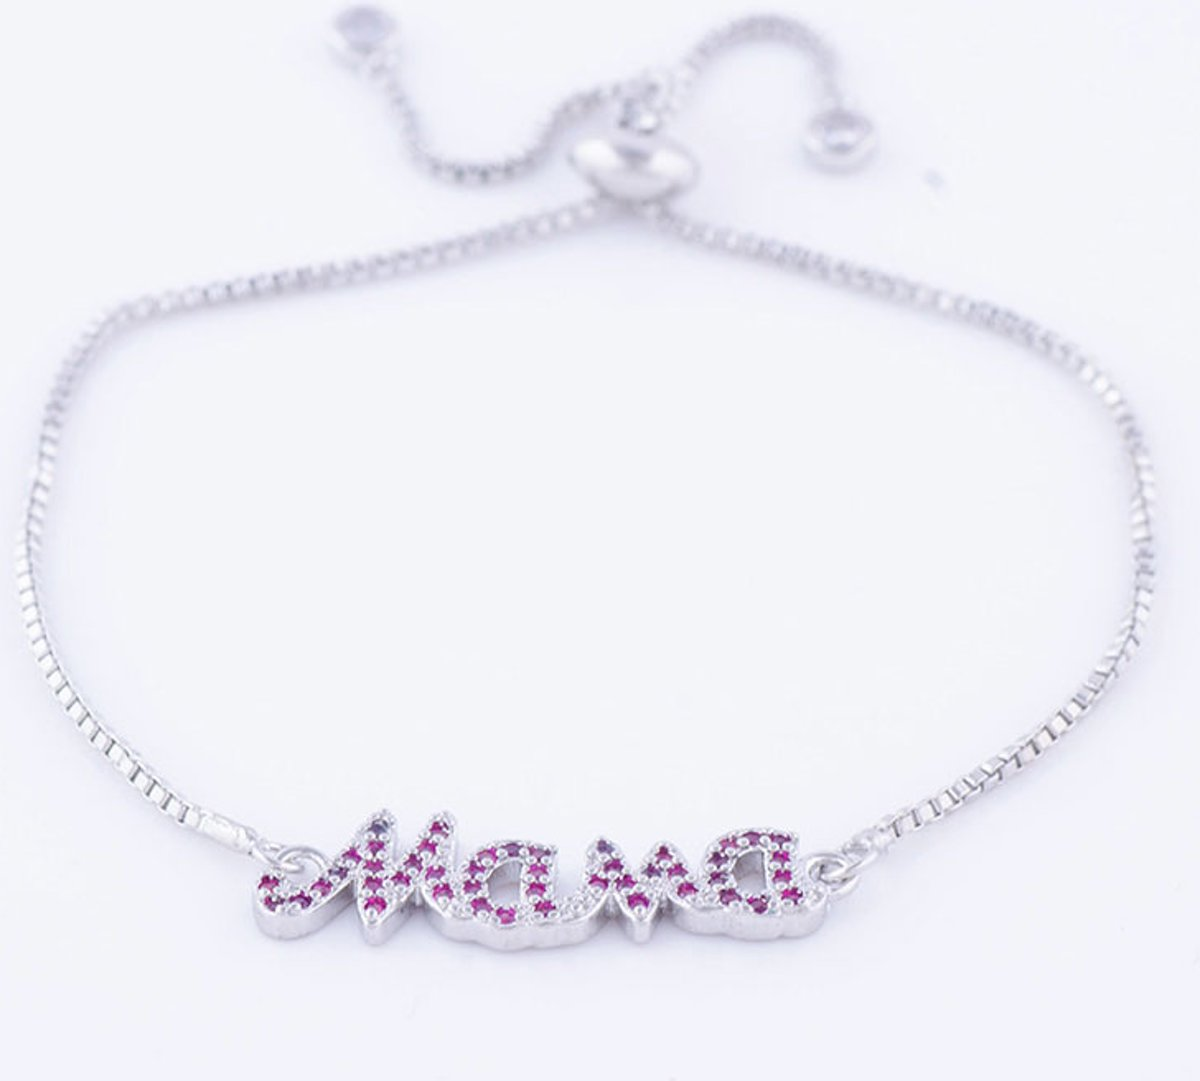 Mama armband - roze zirconia - moederdag cadeau kopen